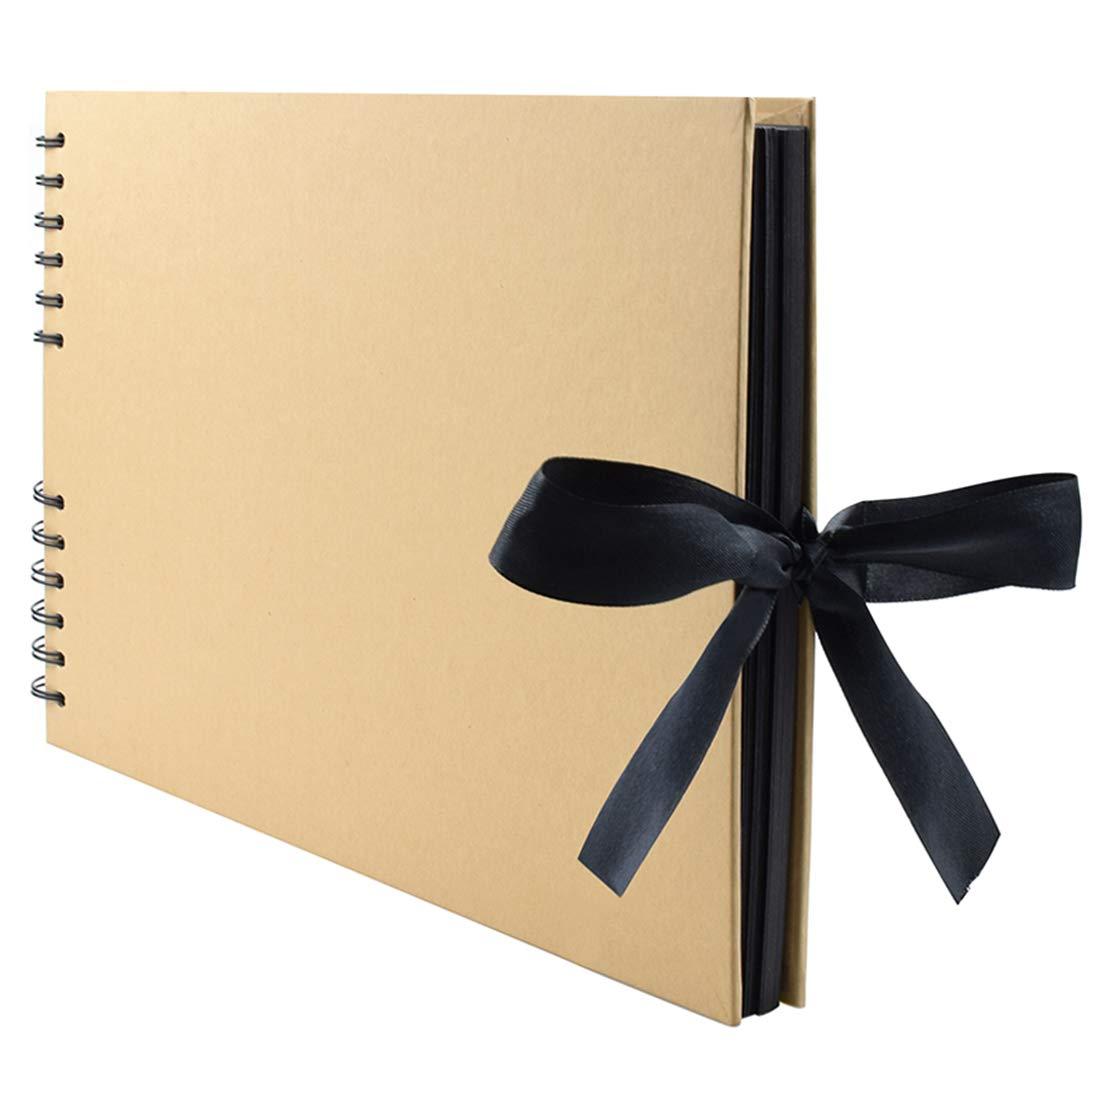 Tosnail 80 Pages Scrapbook Album Photo Album Memory Book 11.5 x 8